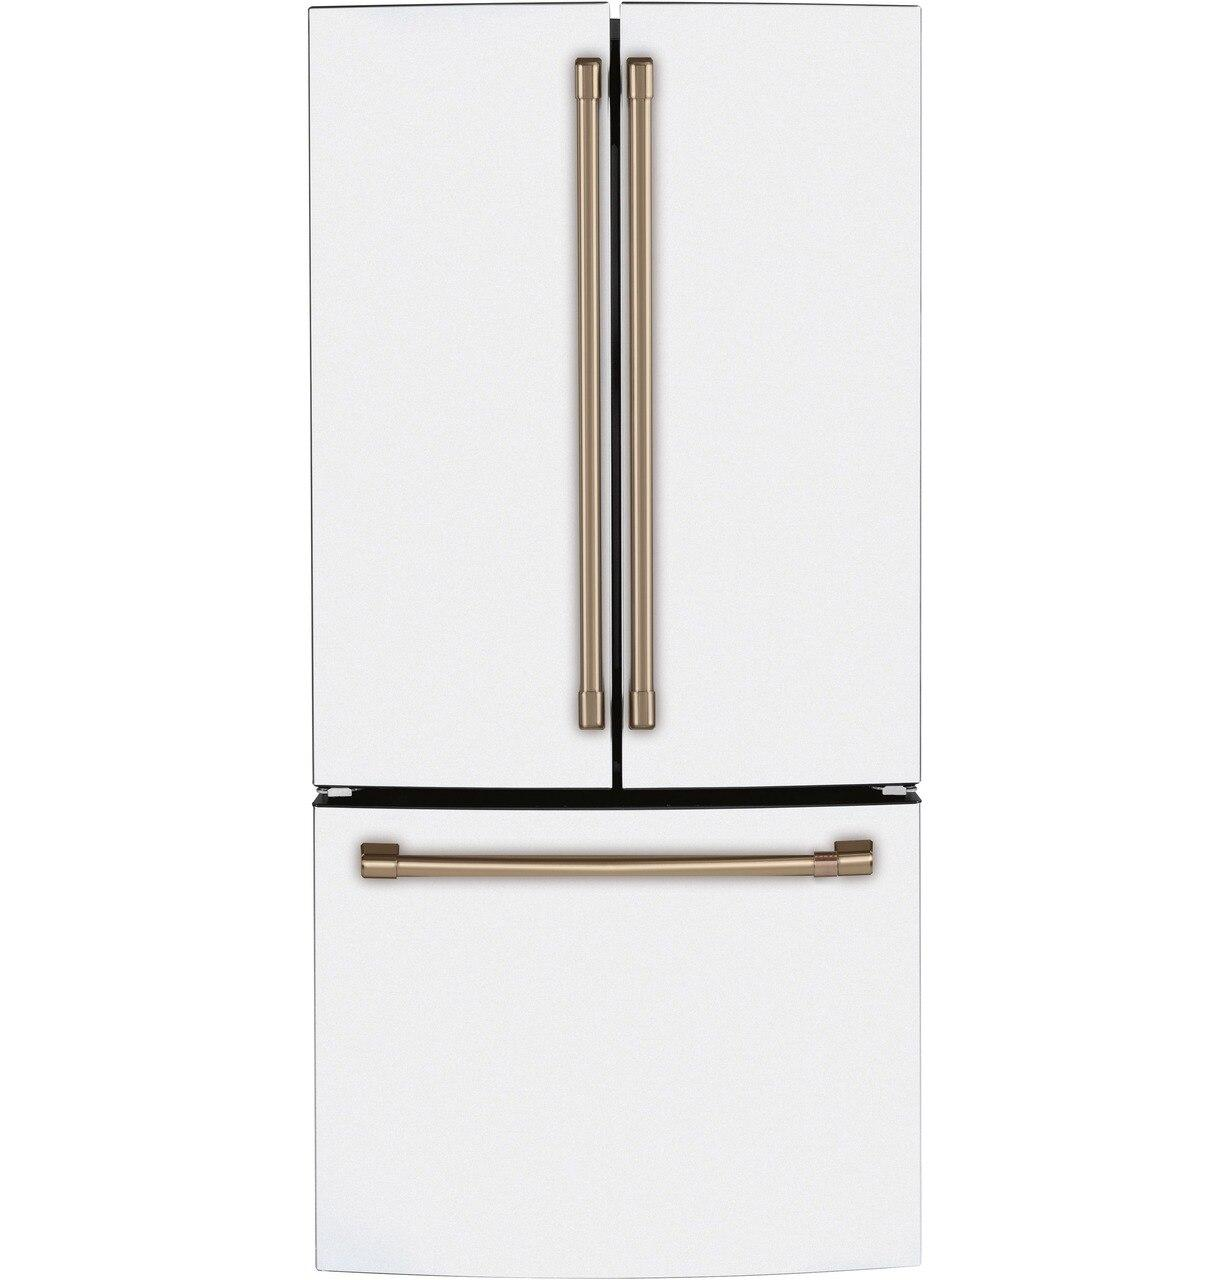 CafeEnergy Star® 18.6 Cu. Ft. Counter-Depth French-Door Refrigerator